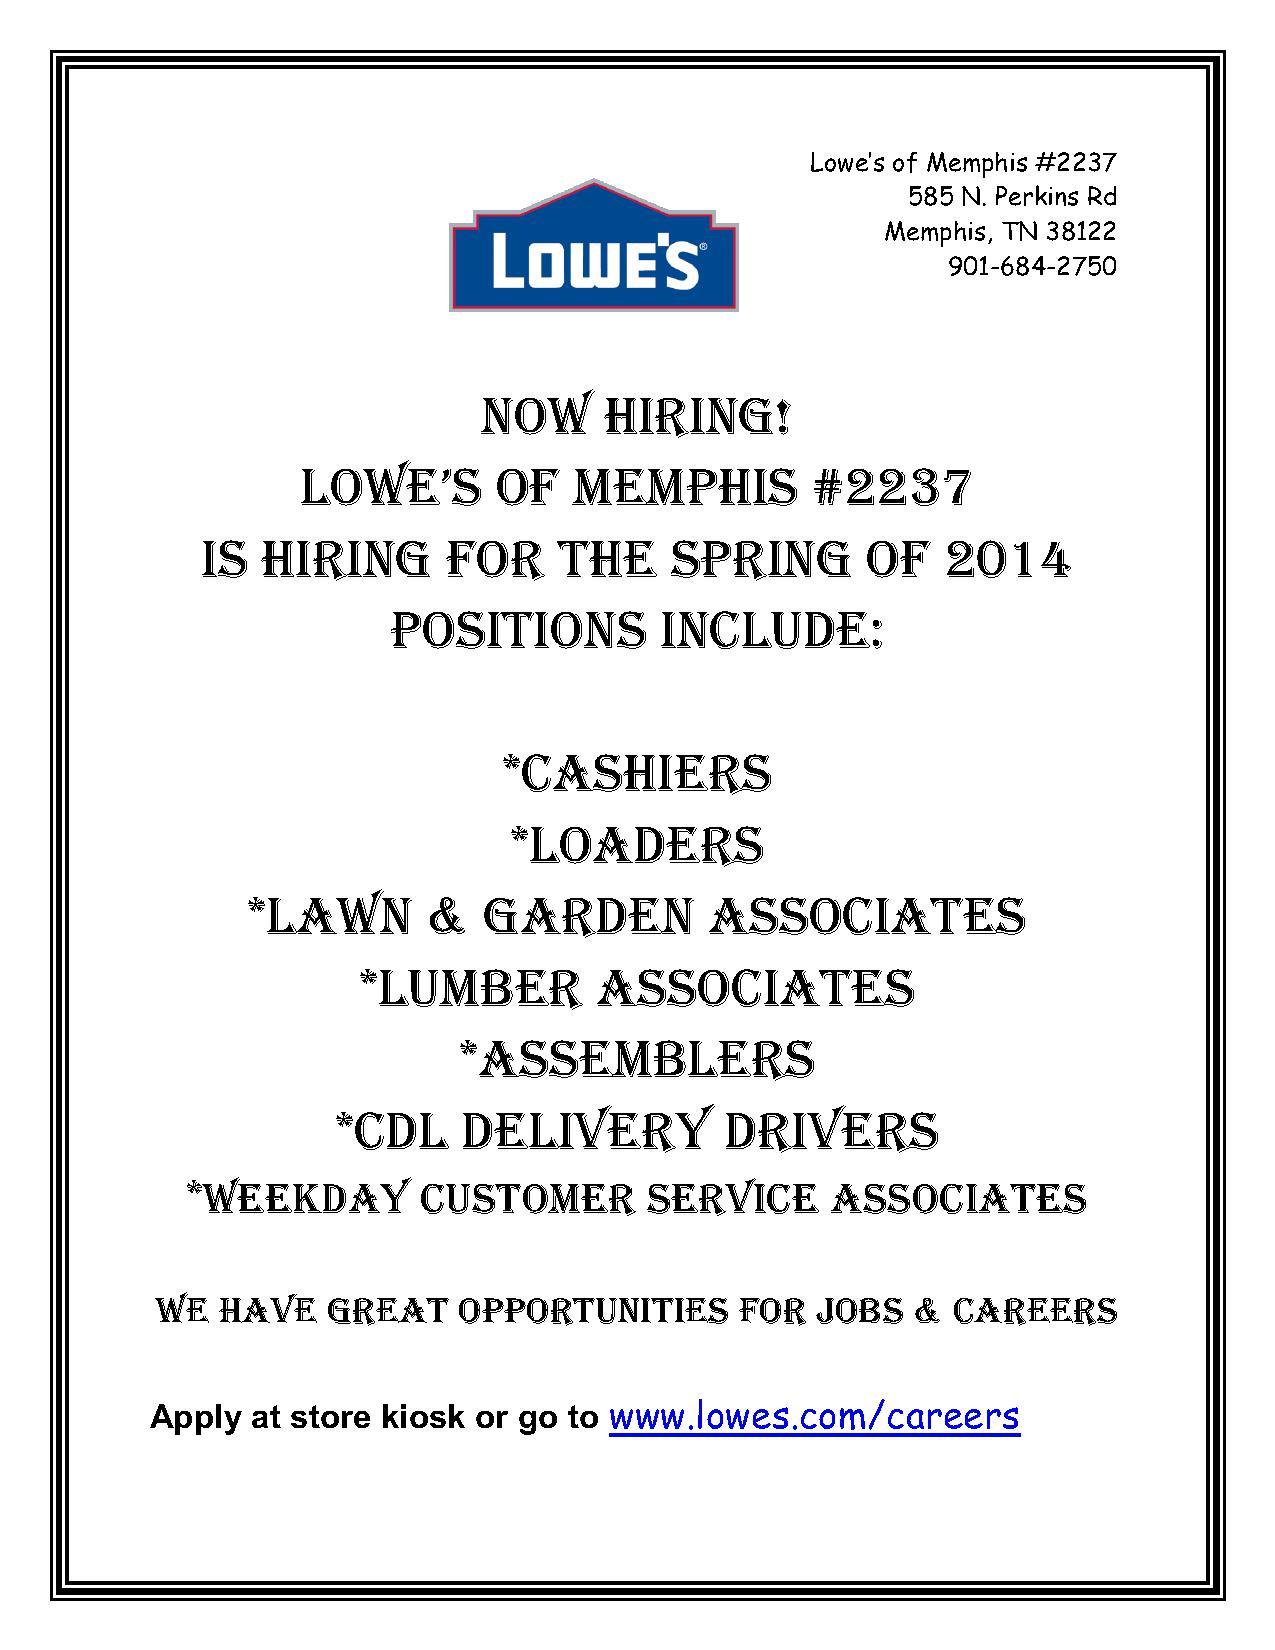 23 January 2014 Job & Career News From The Memphis